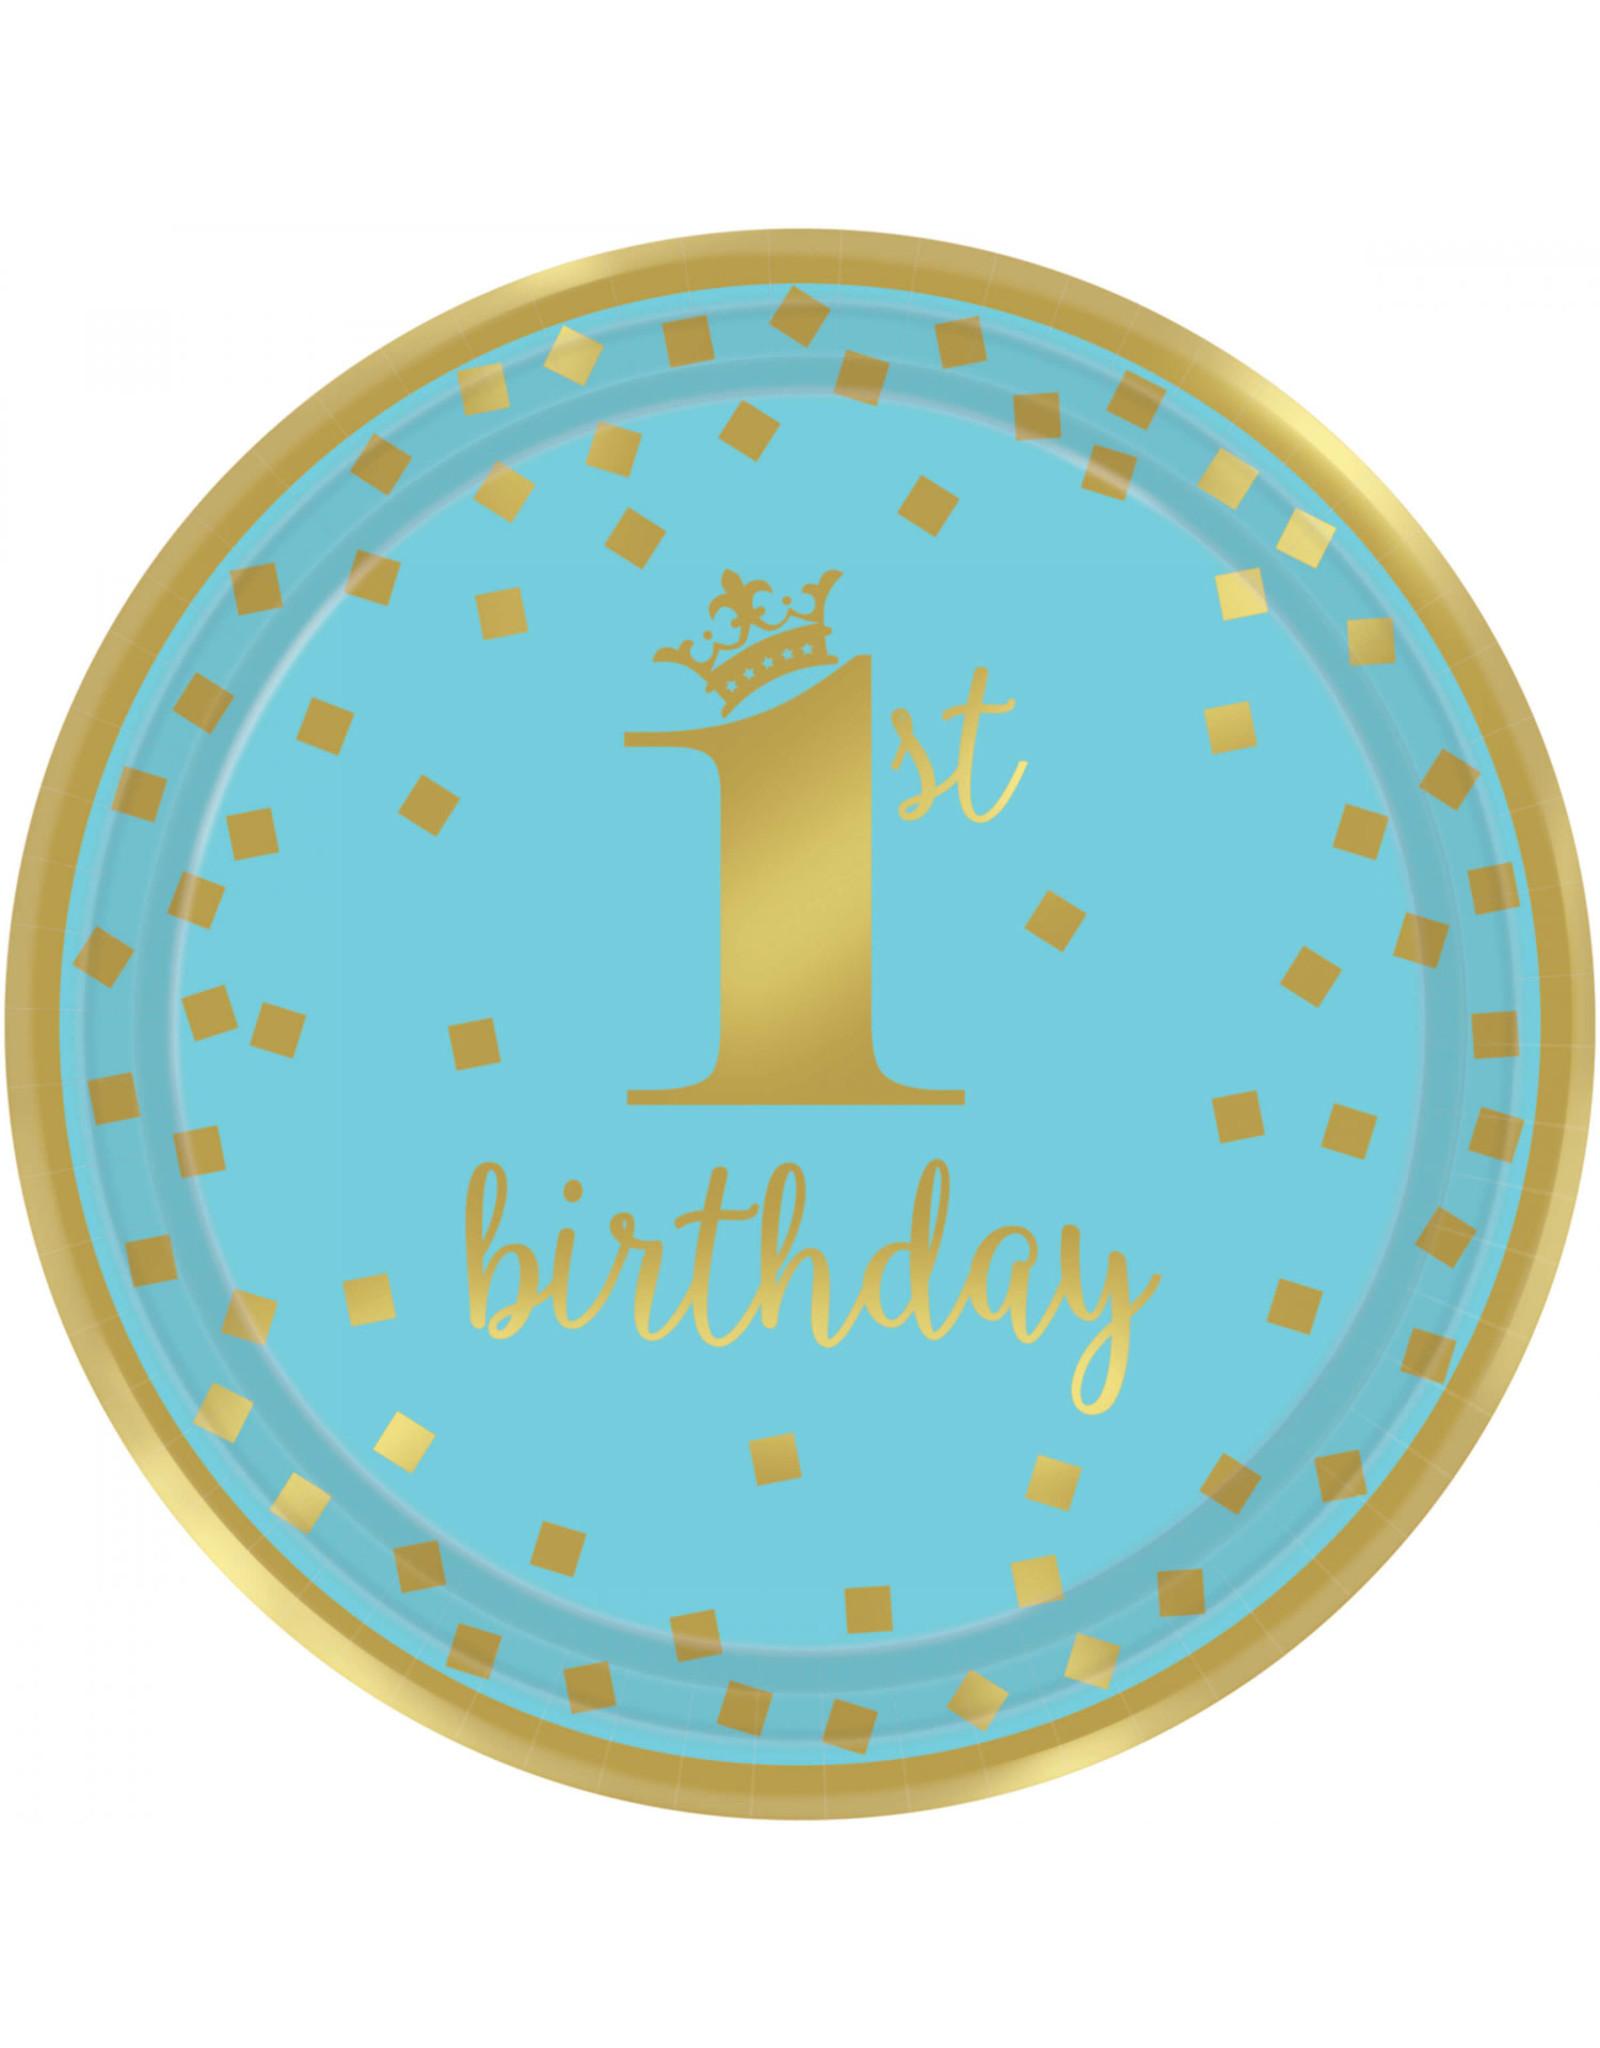 Amscan 1e verjaardag borden blauw goud 22.9 cm 8 stuks